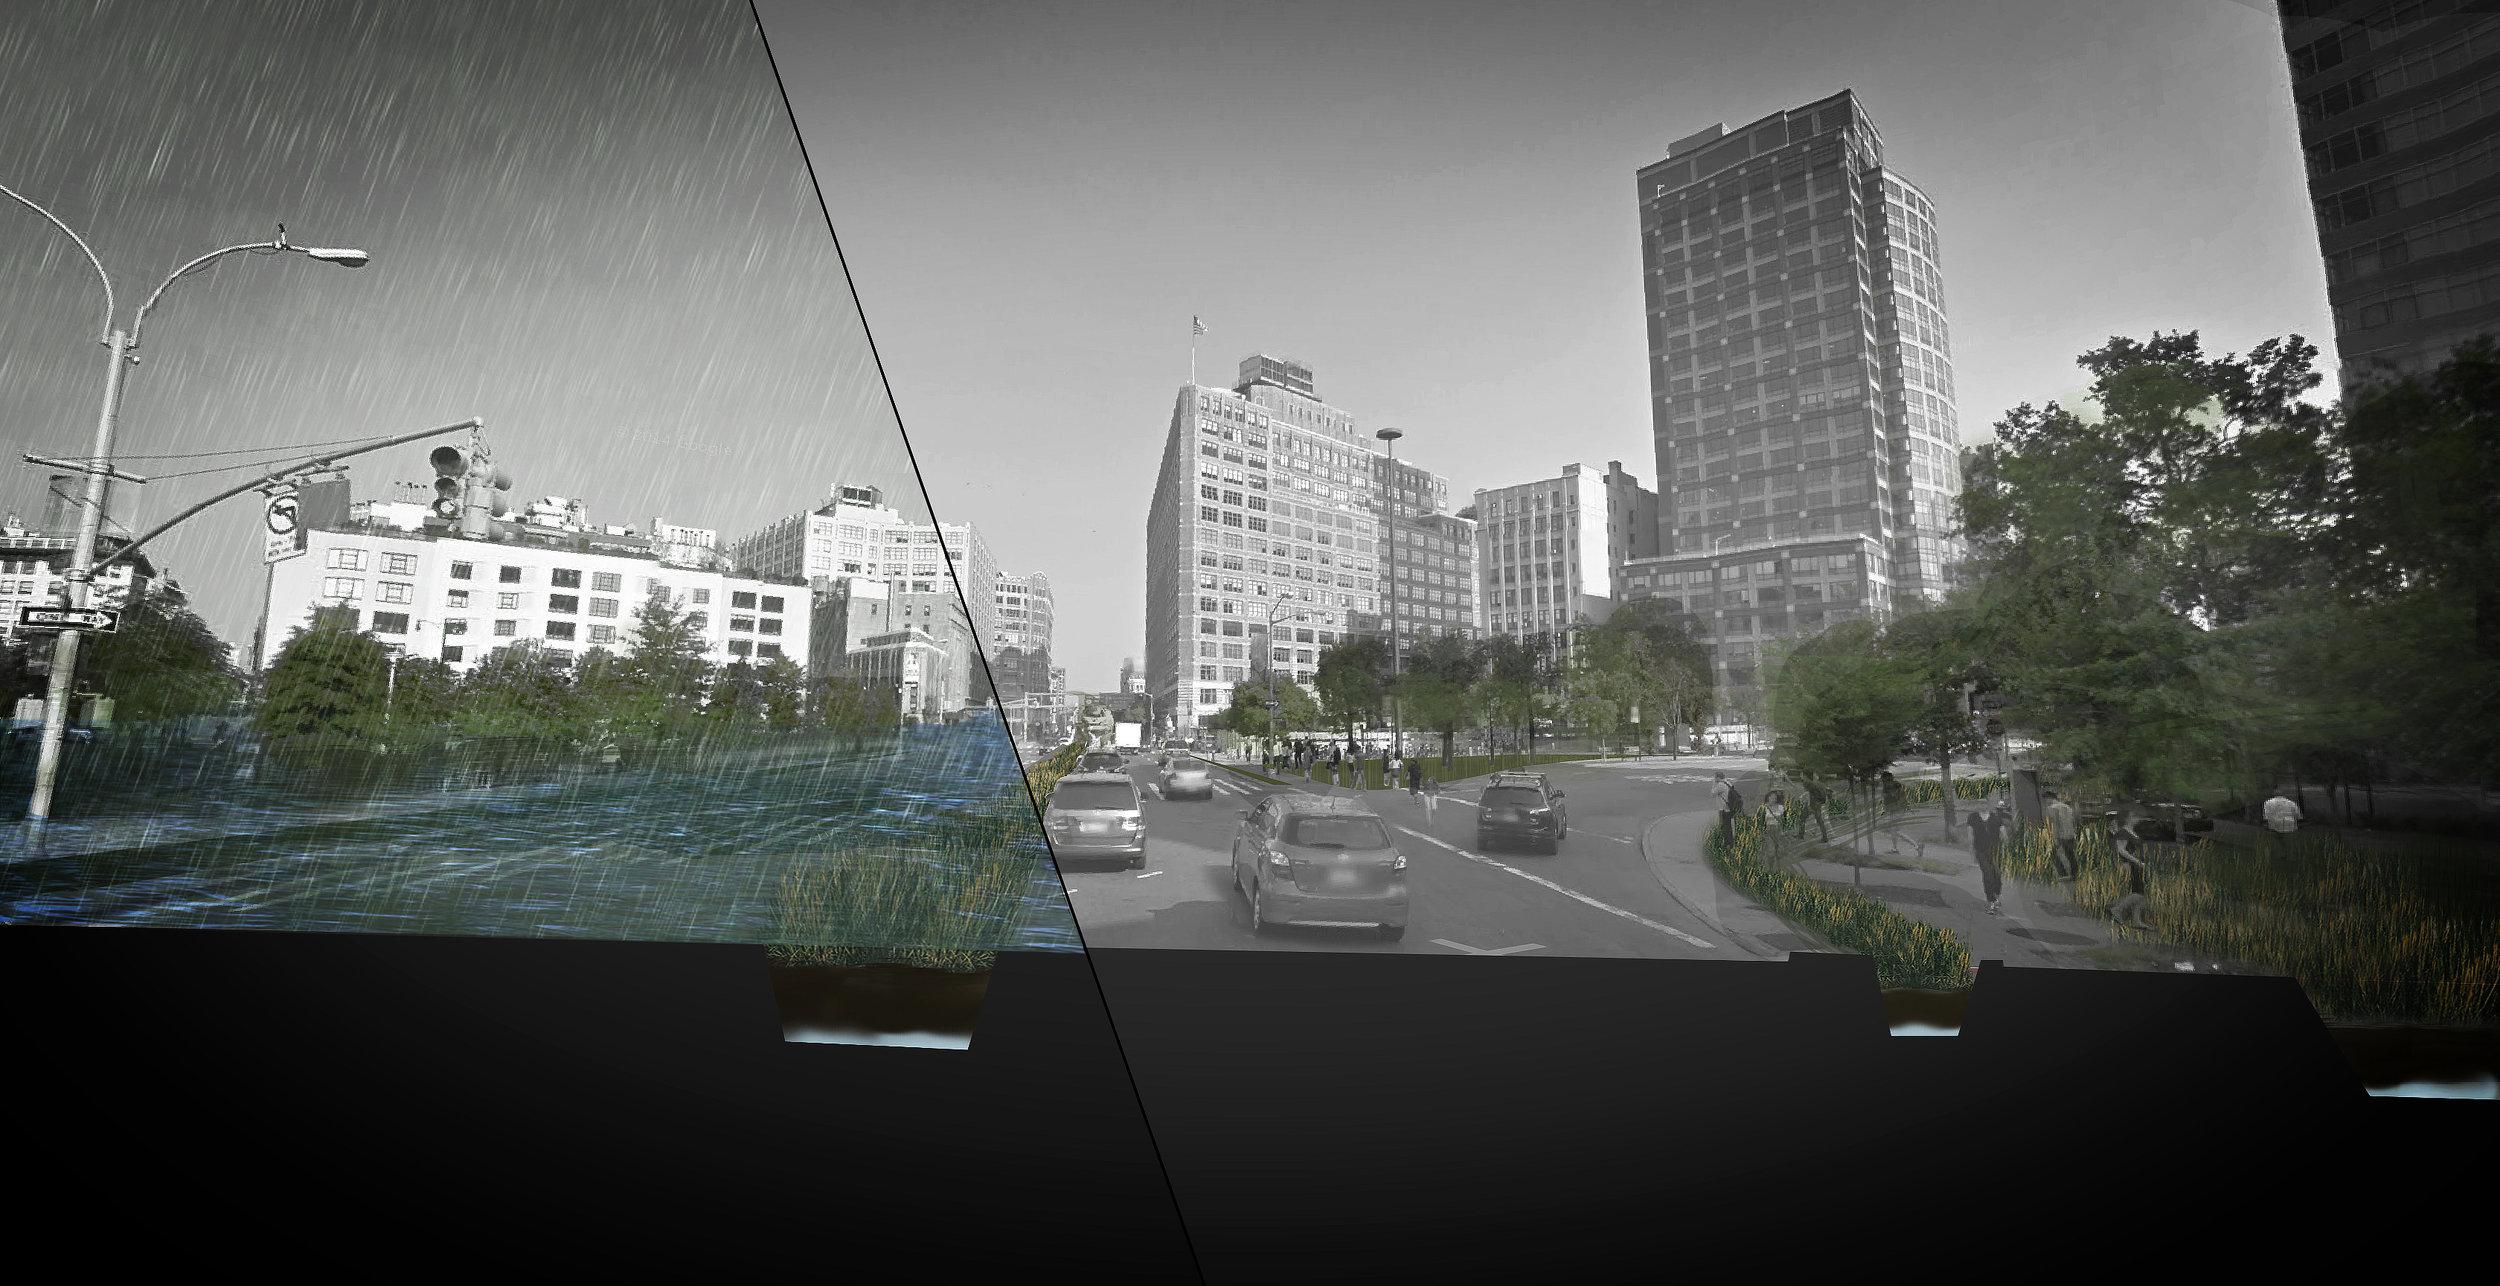 Perspective1_edit.jpg